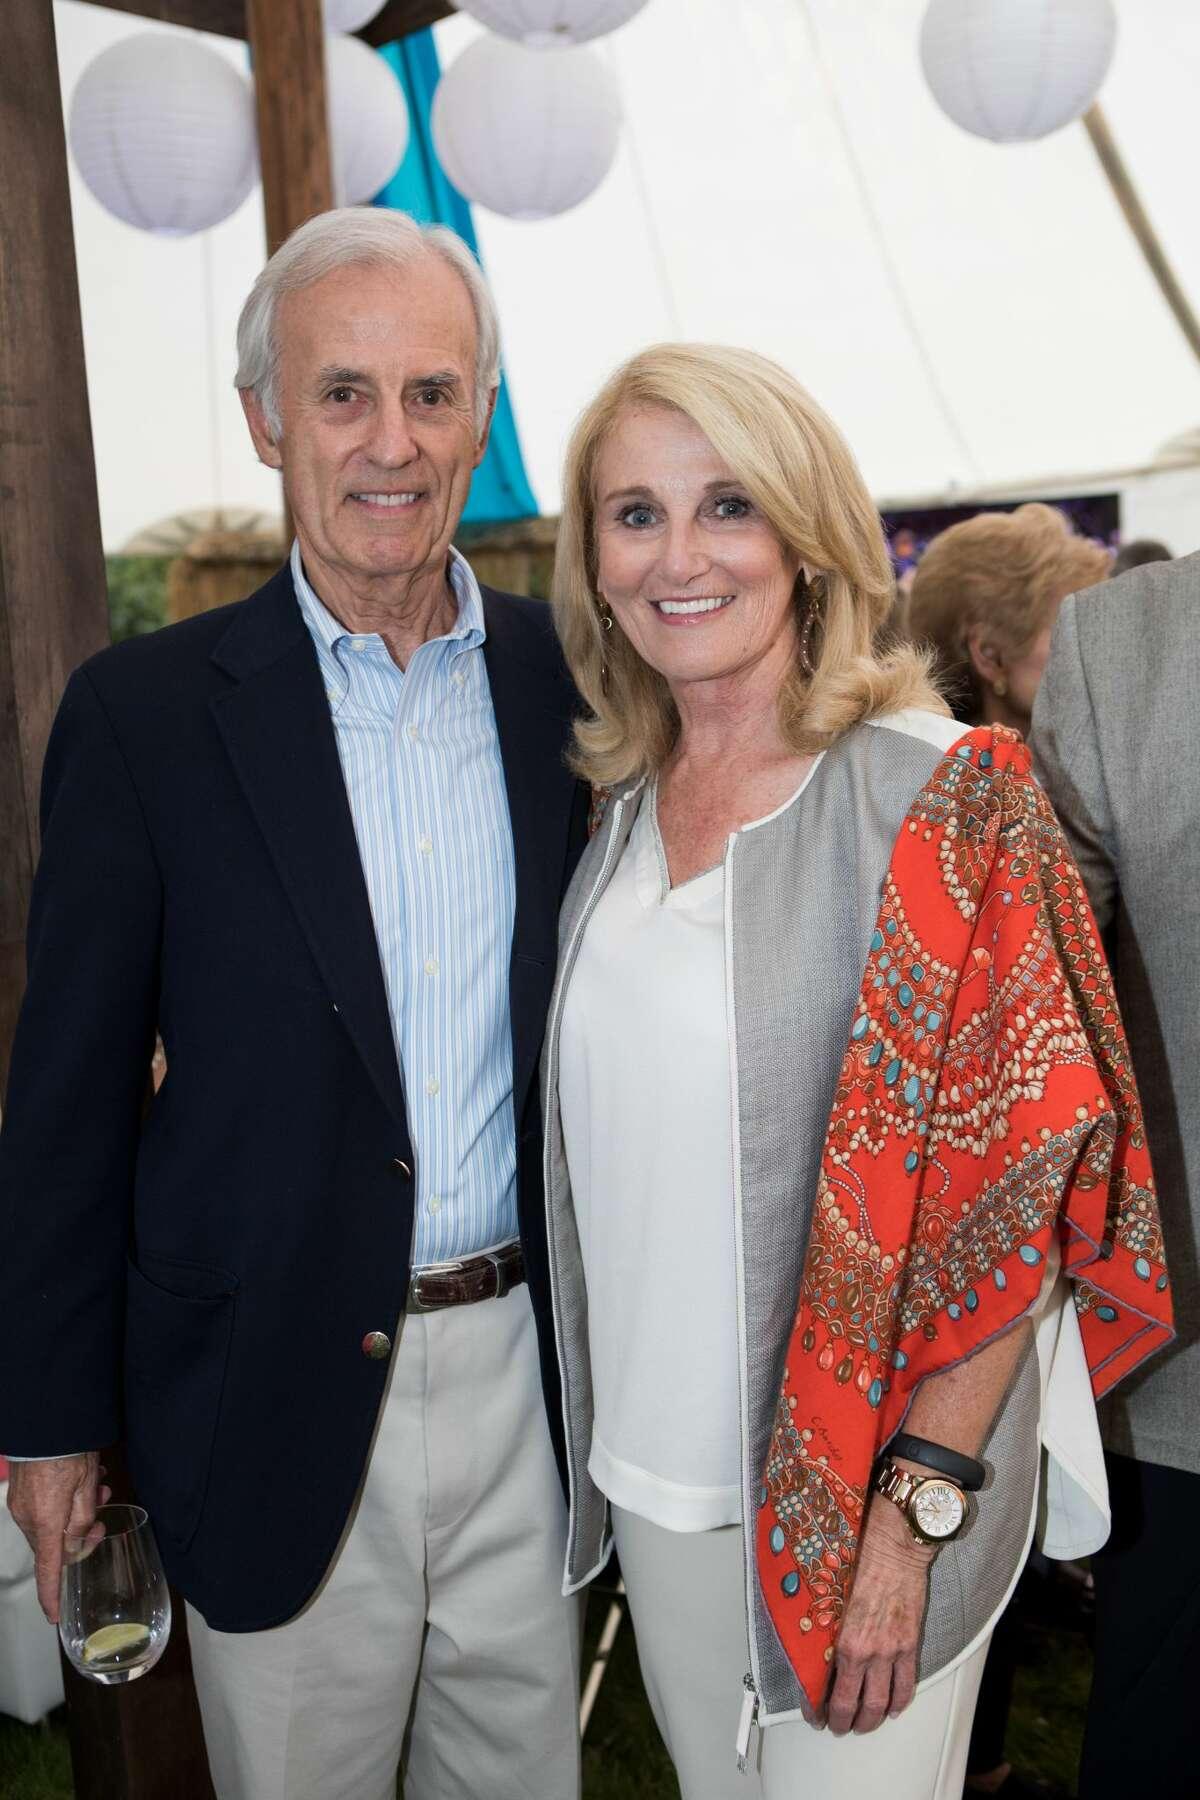 Jim Martin and Denise Monteleone